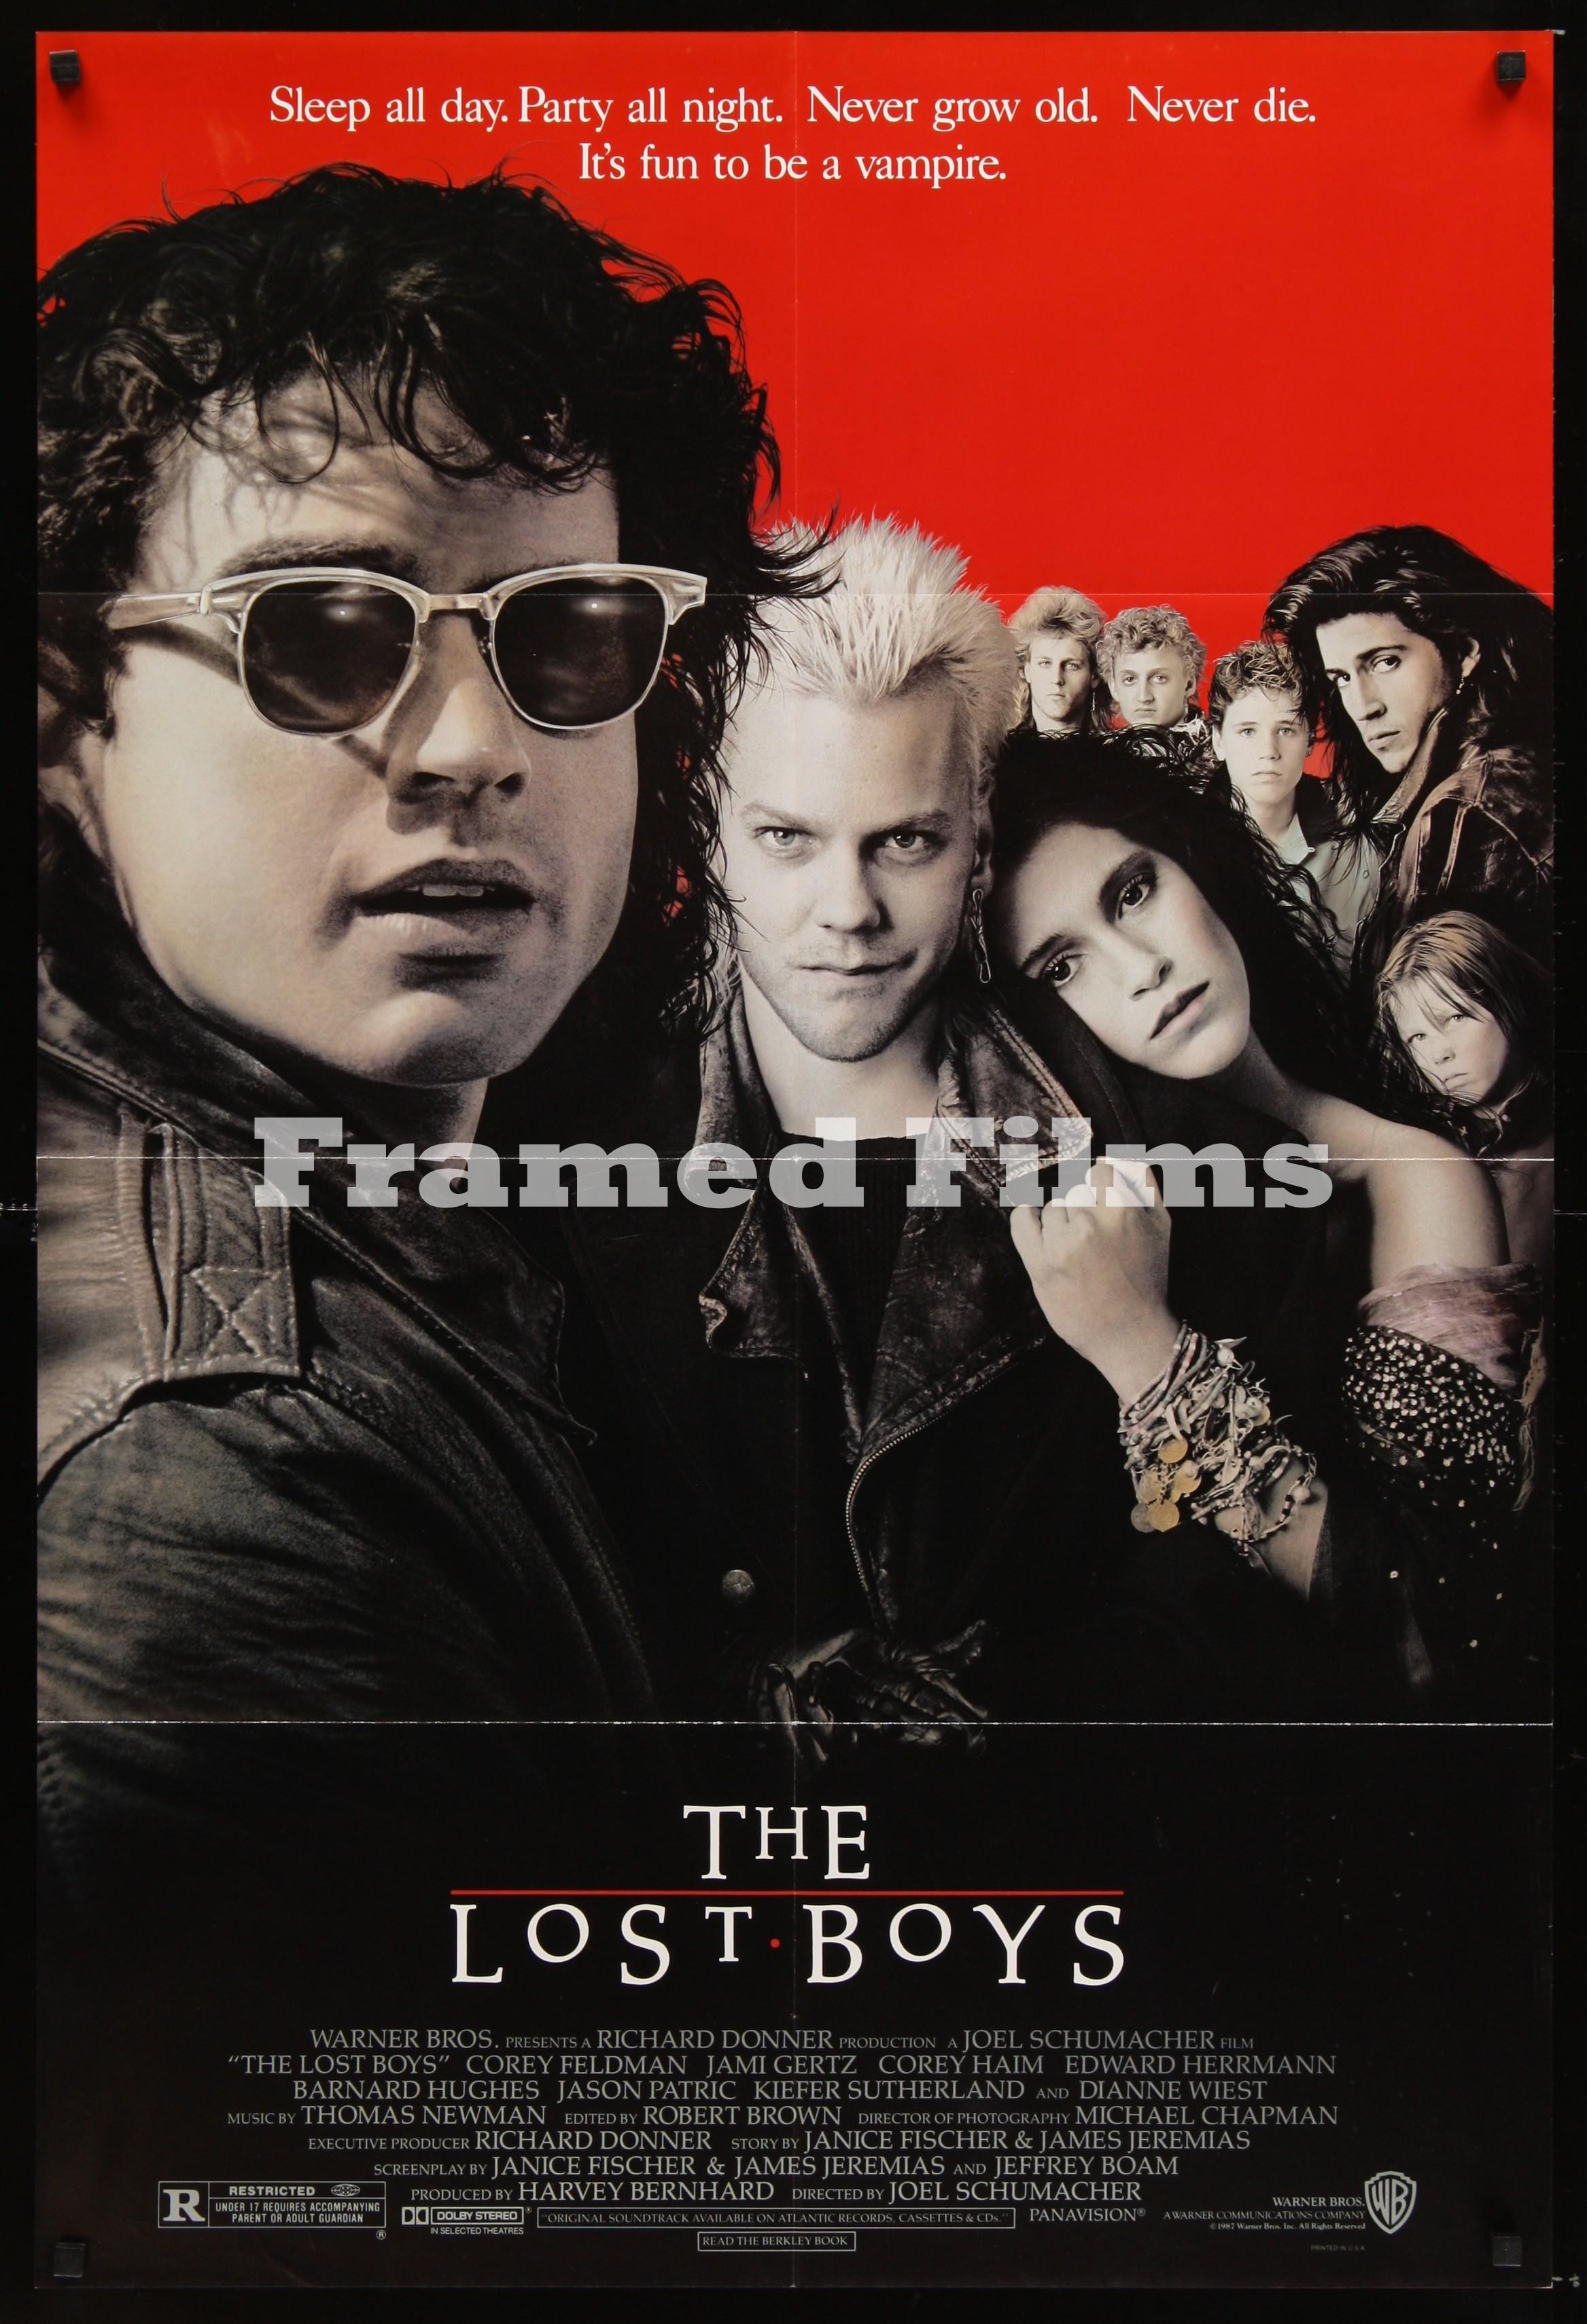 lost_boys_NZ03223_L.jpg